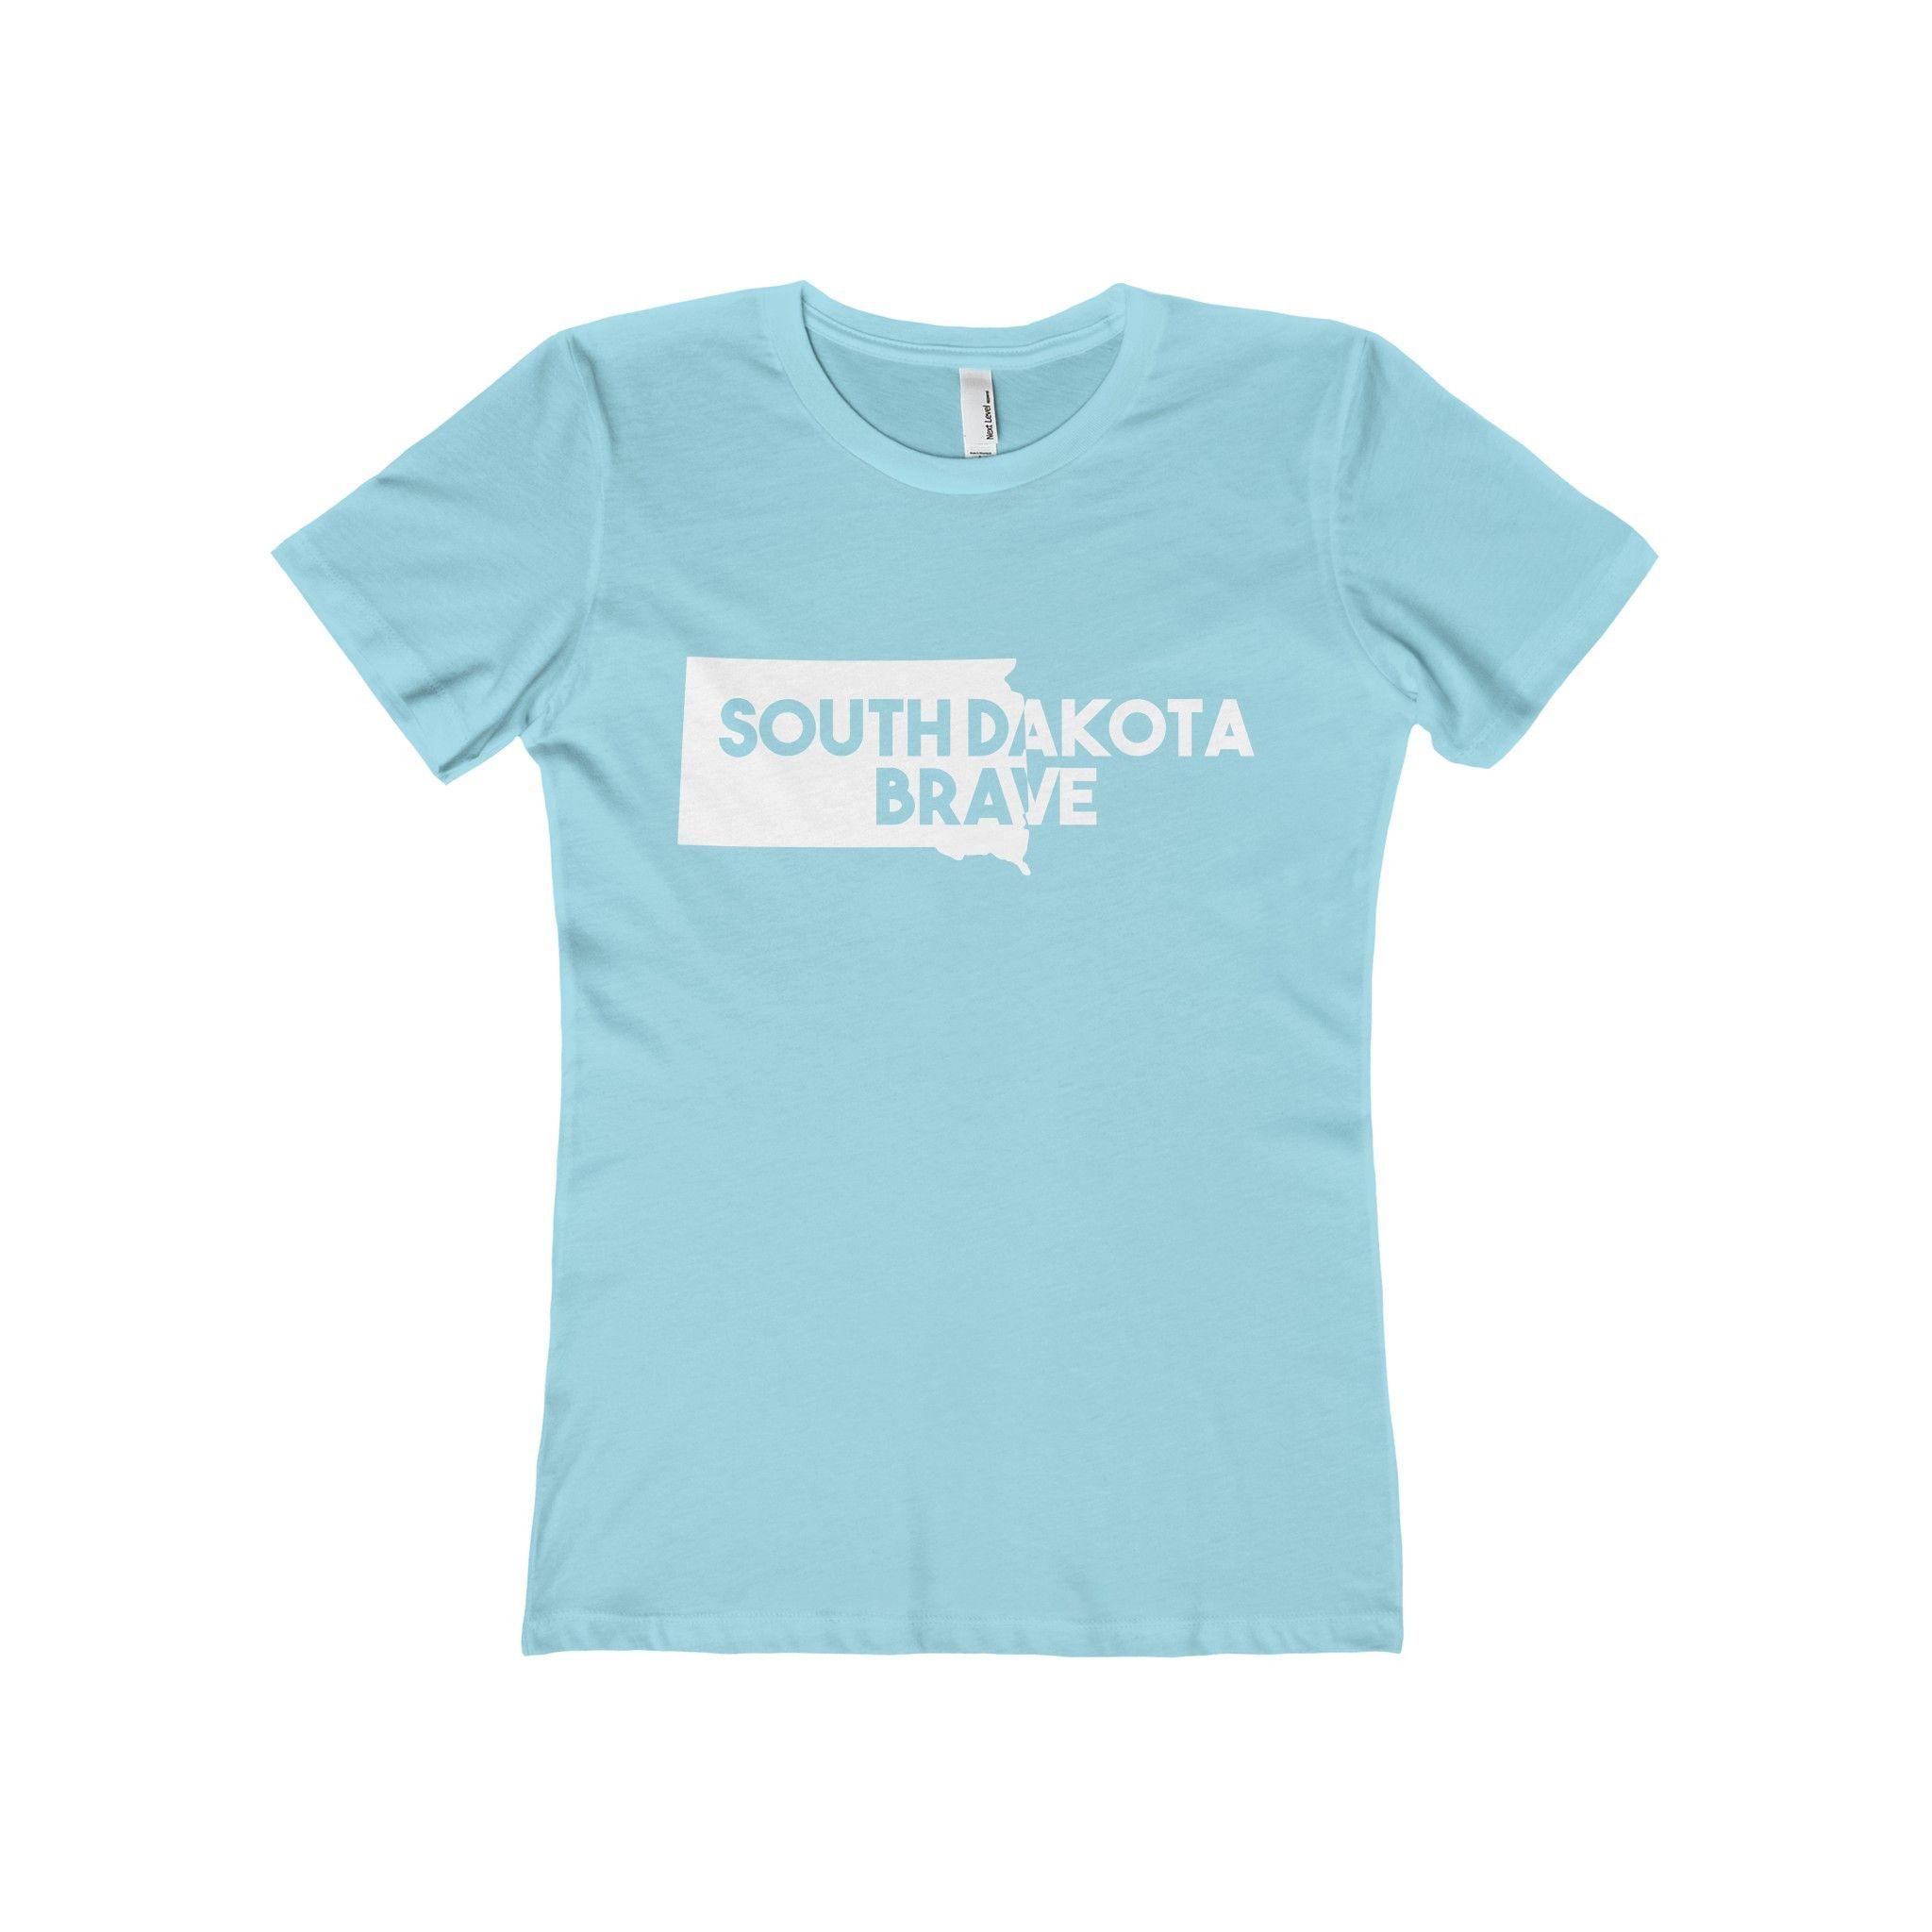 South Dakota Brave